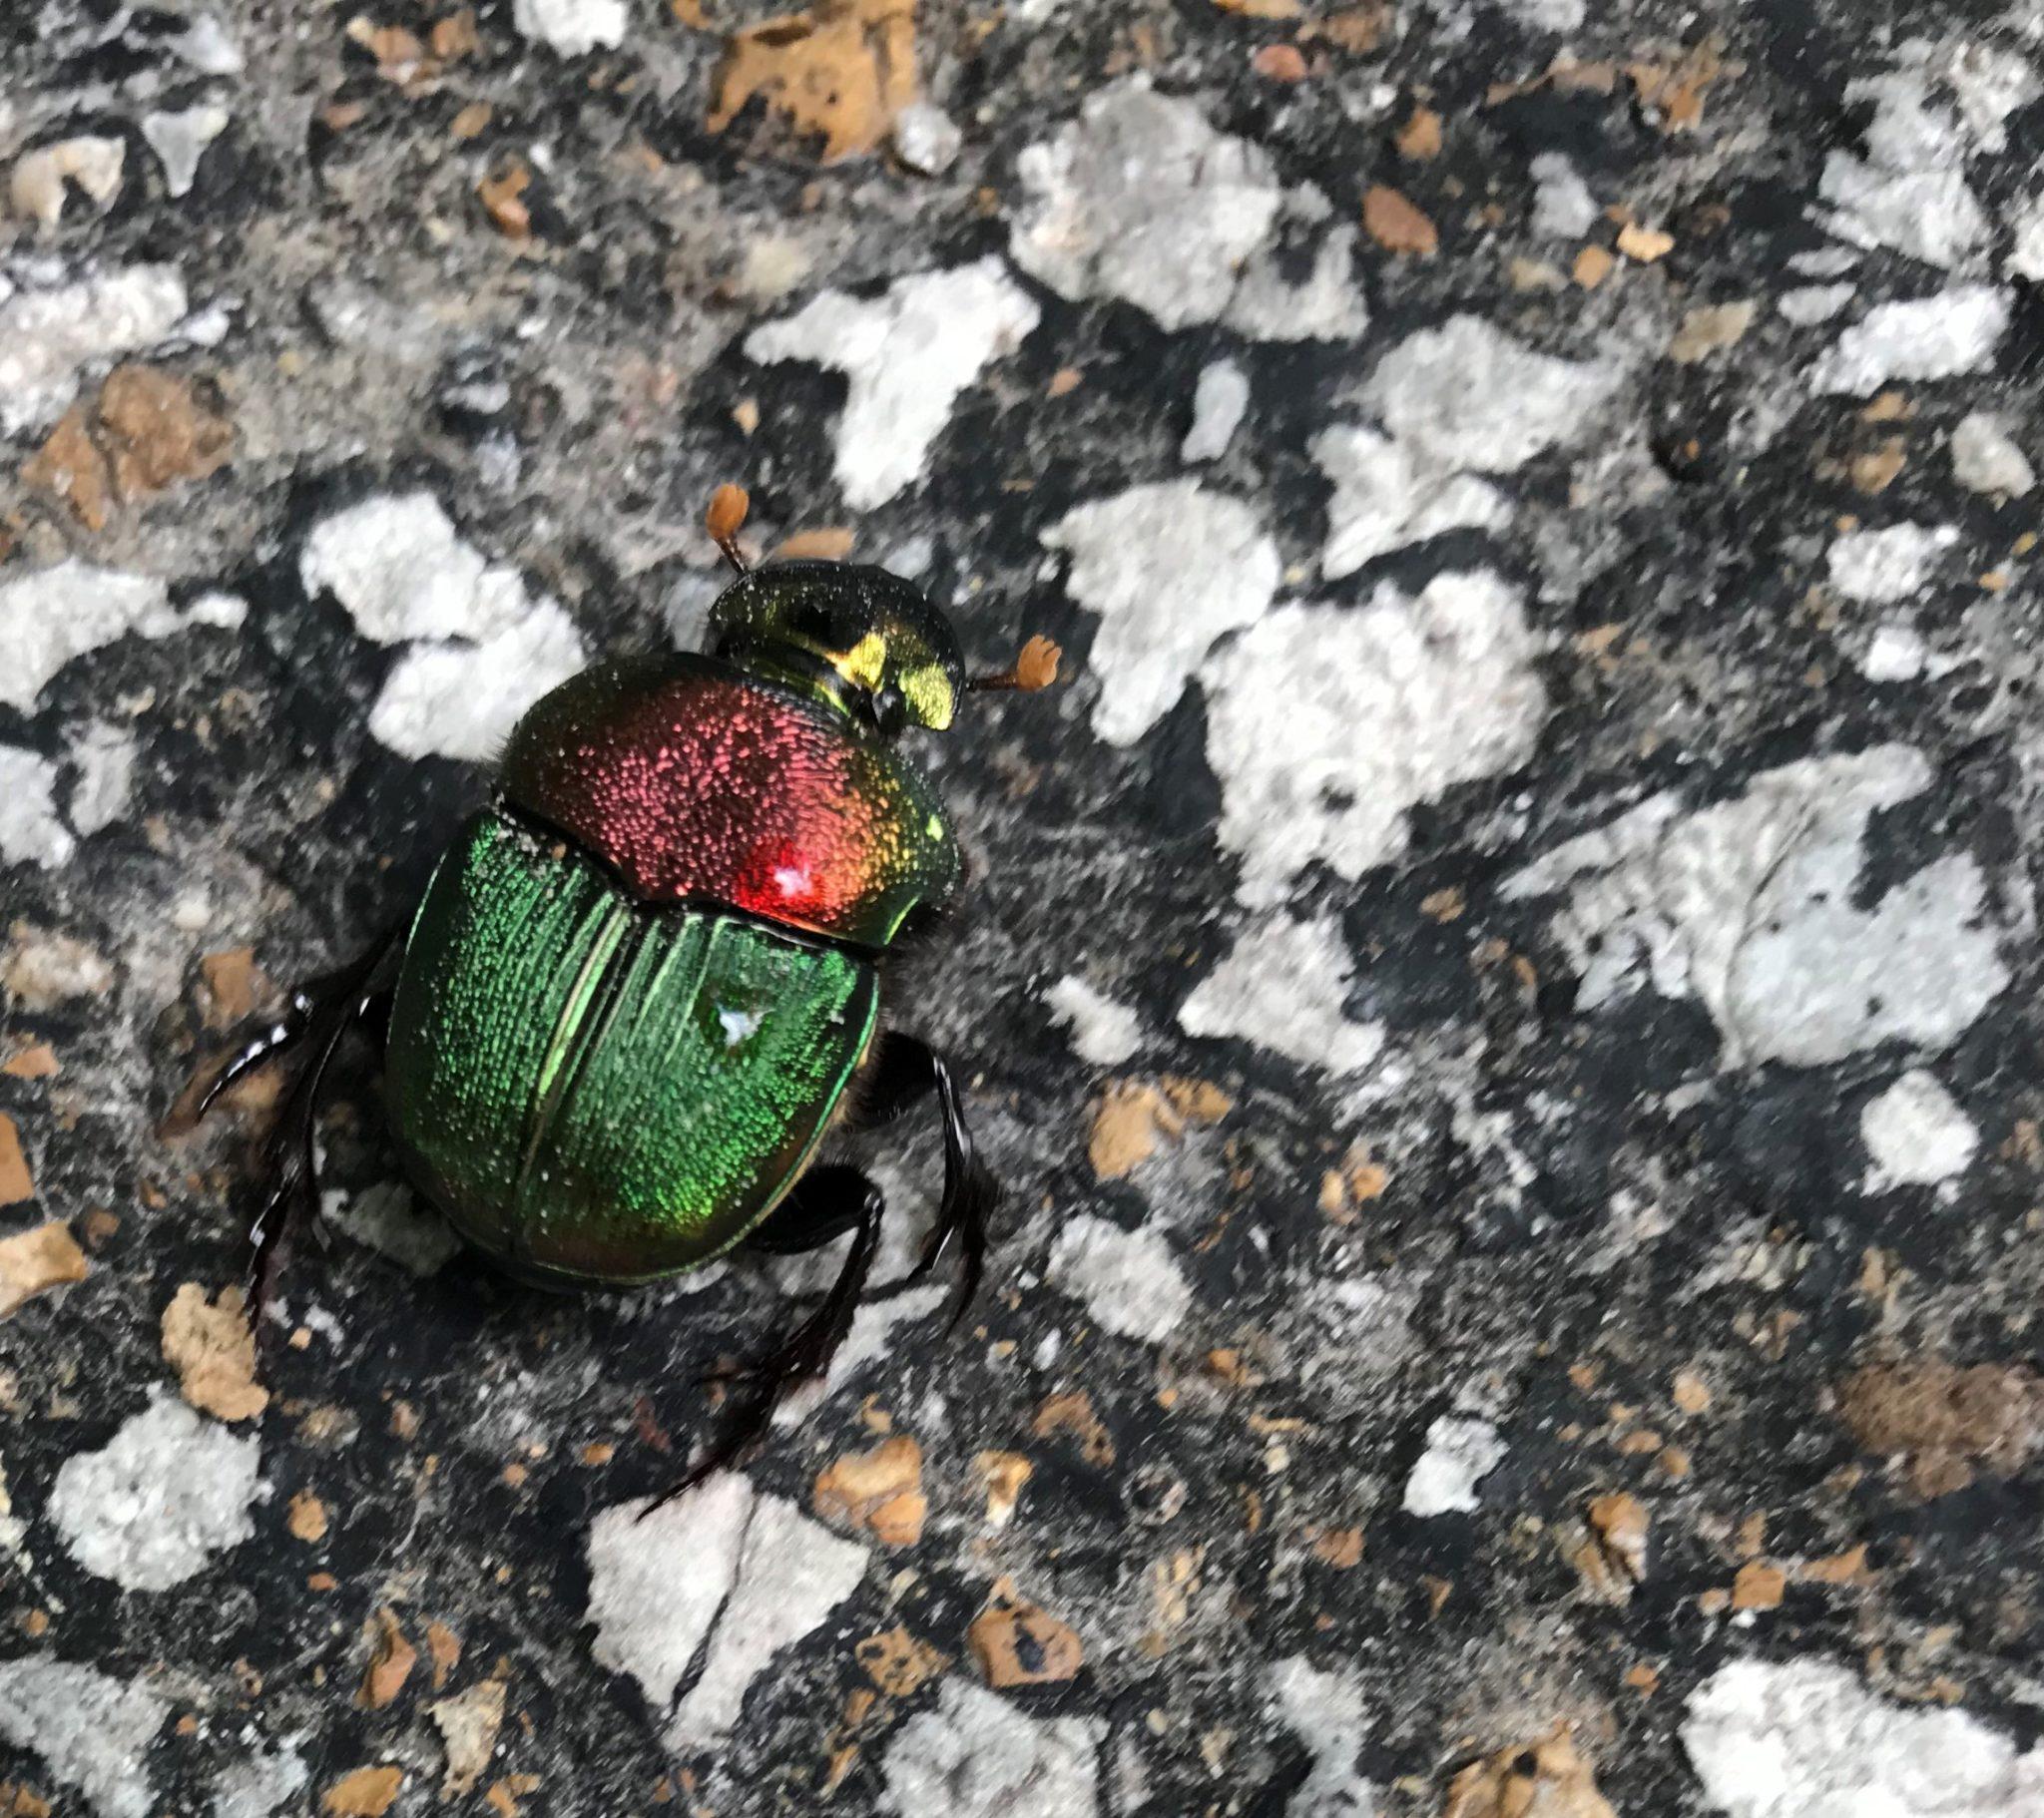 Rainbow Dung Beetle